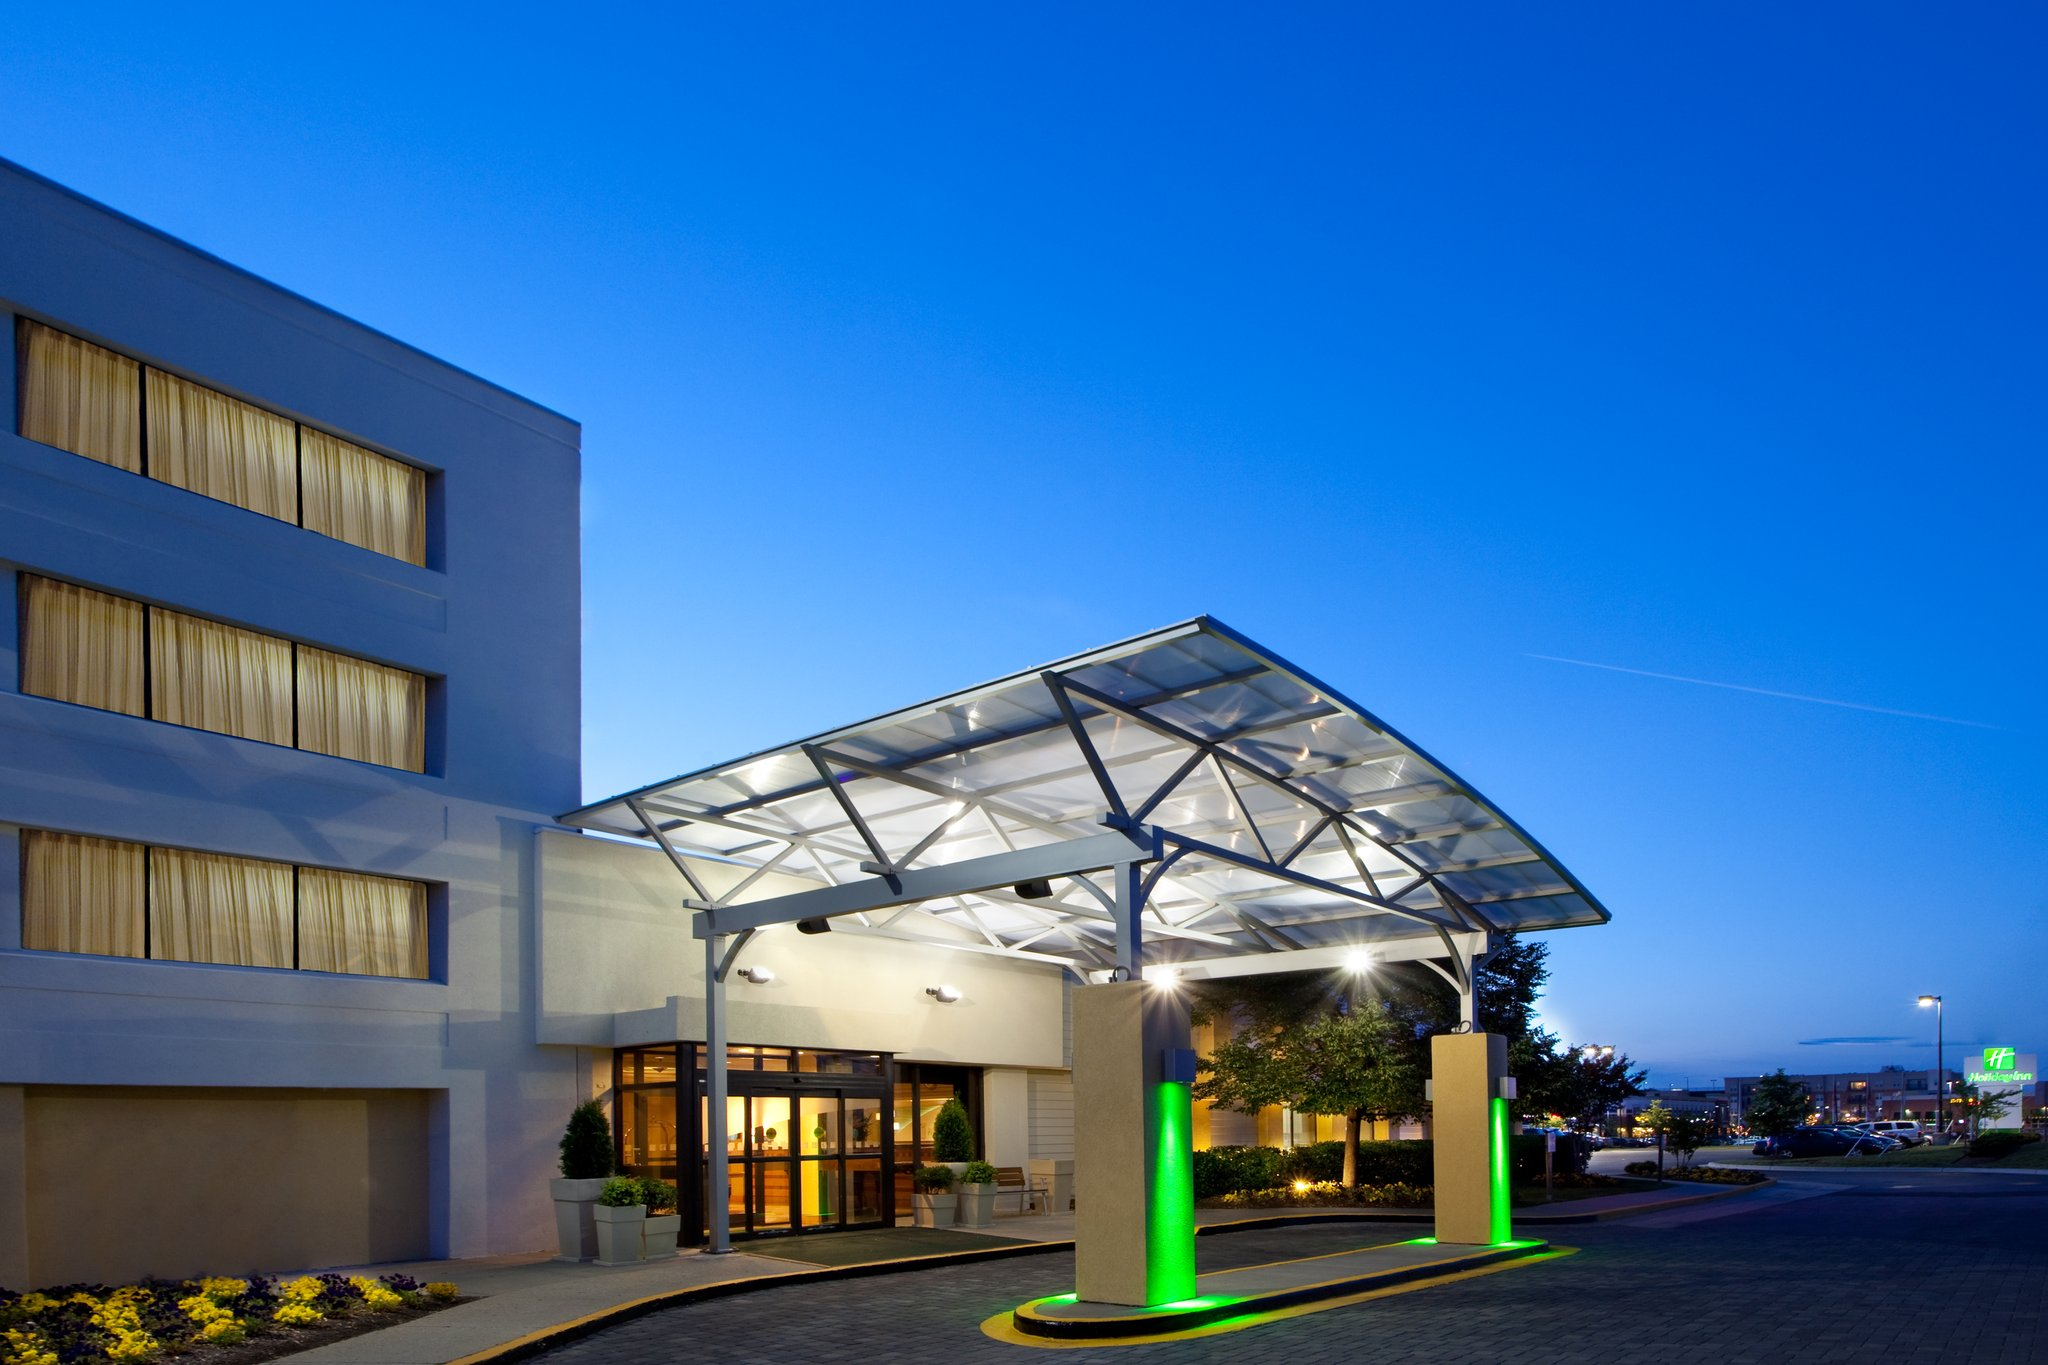 Holiday Inn Washington-College Pk (1-95)